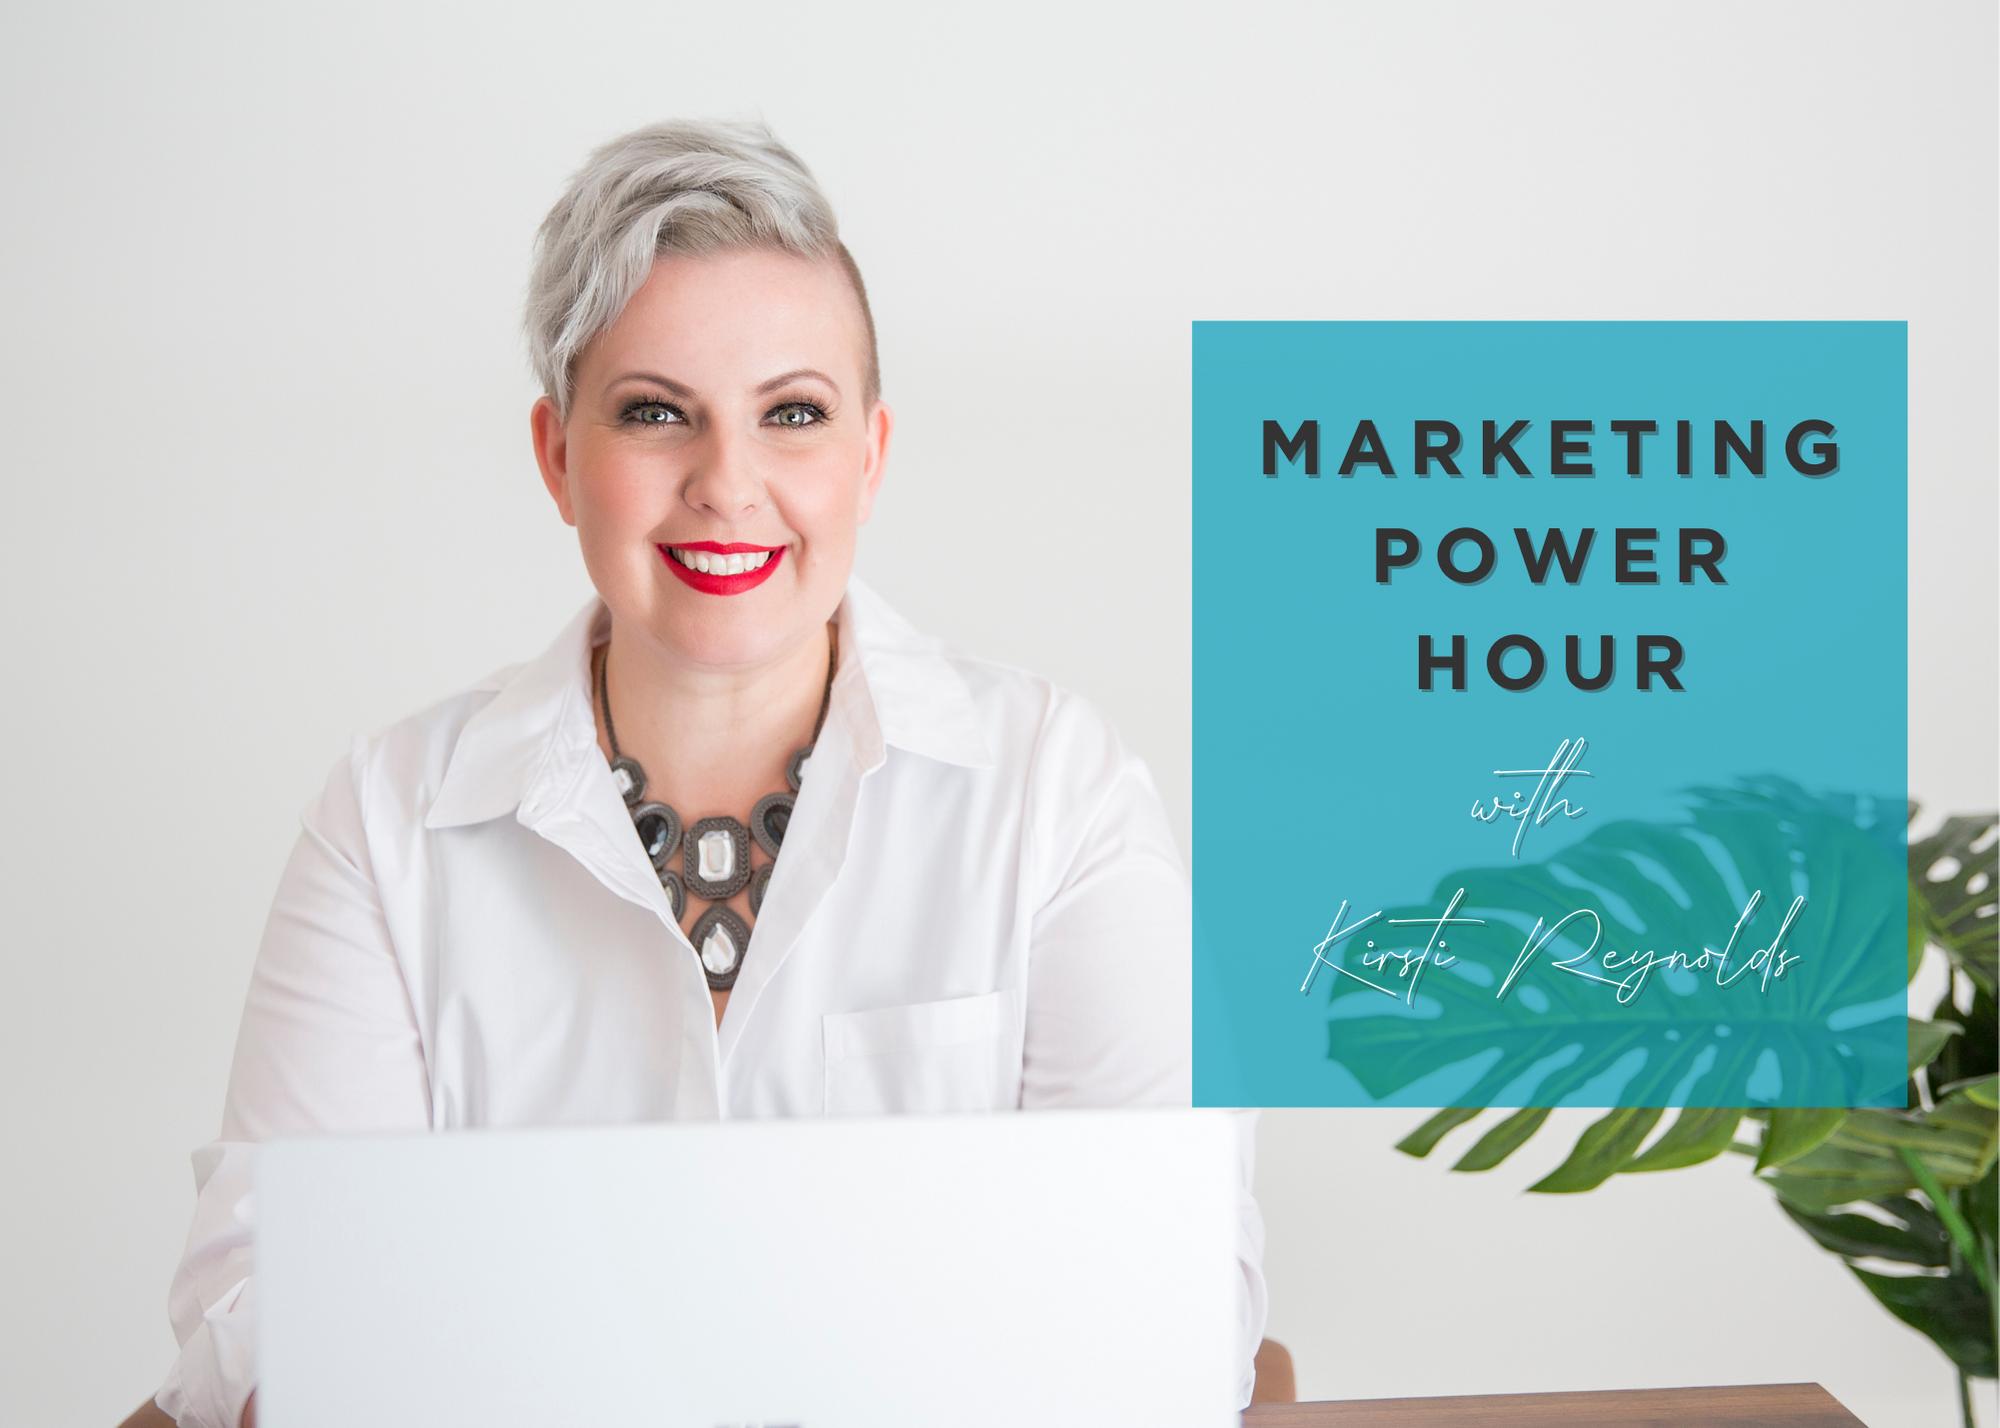 Online Marketing Power Hour